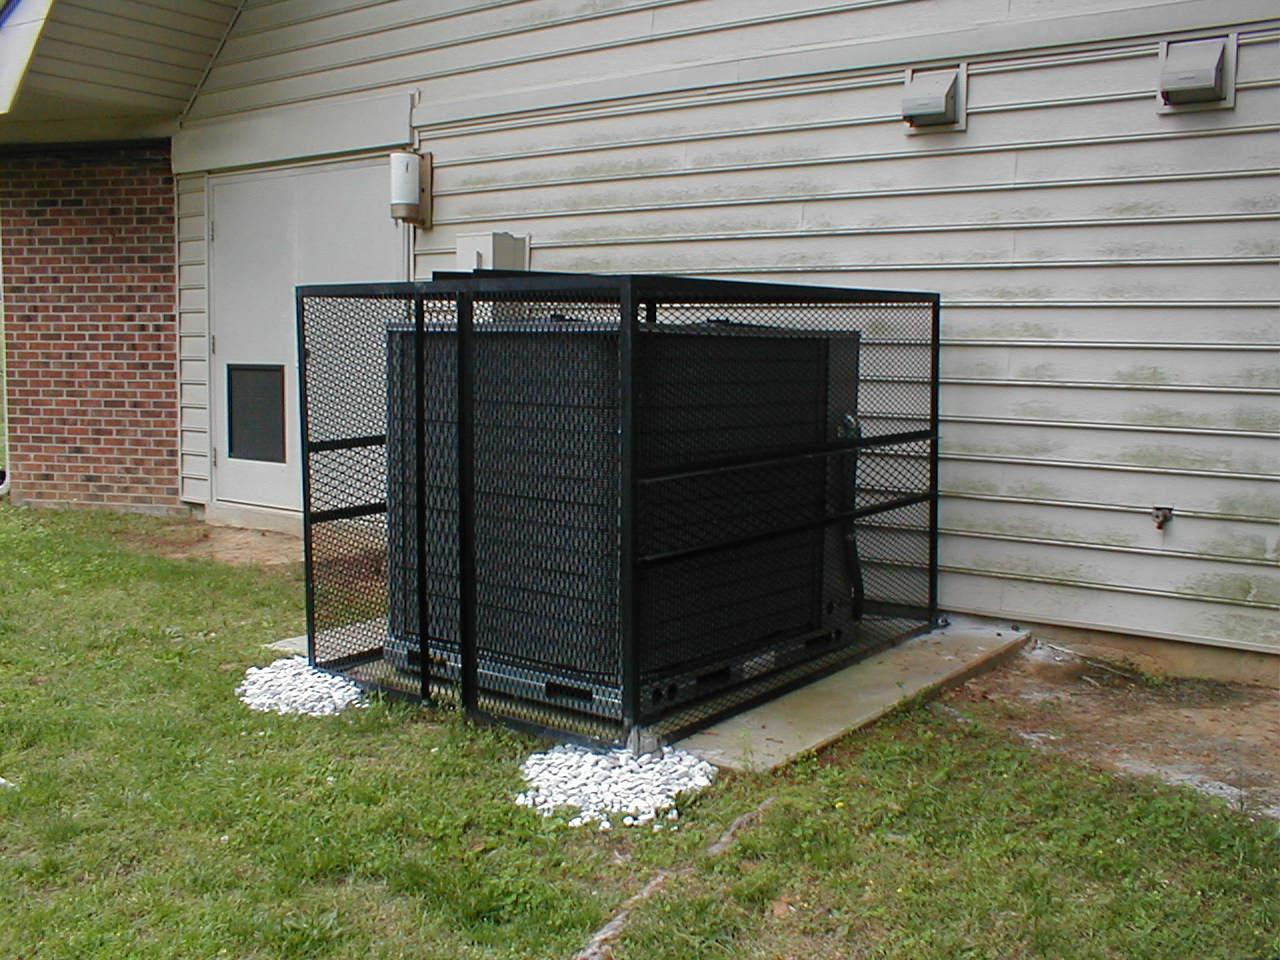 air conditioner cage one wire alternator wiring diagram mopar black metal design build the roll hinged hvac